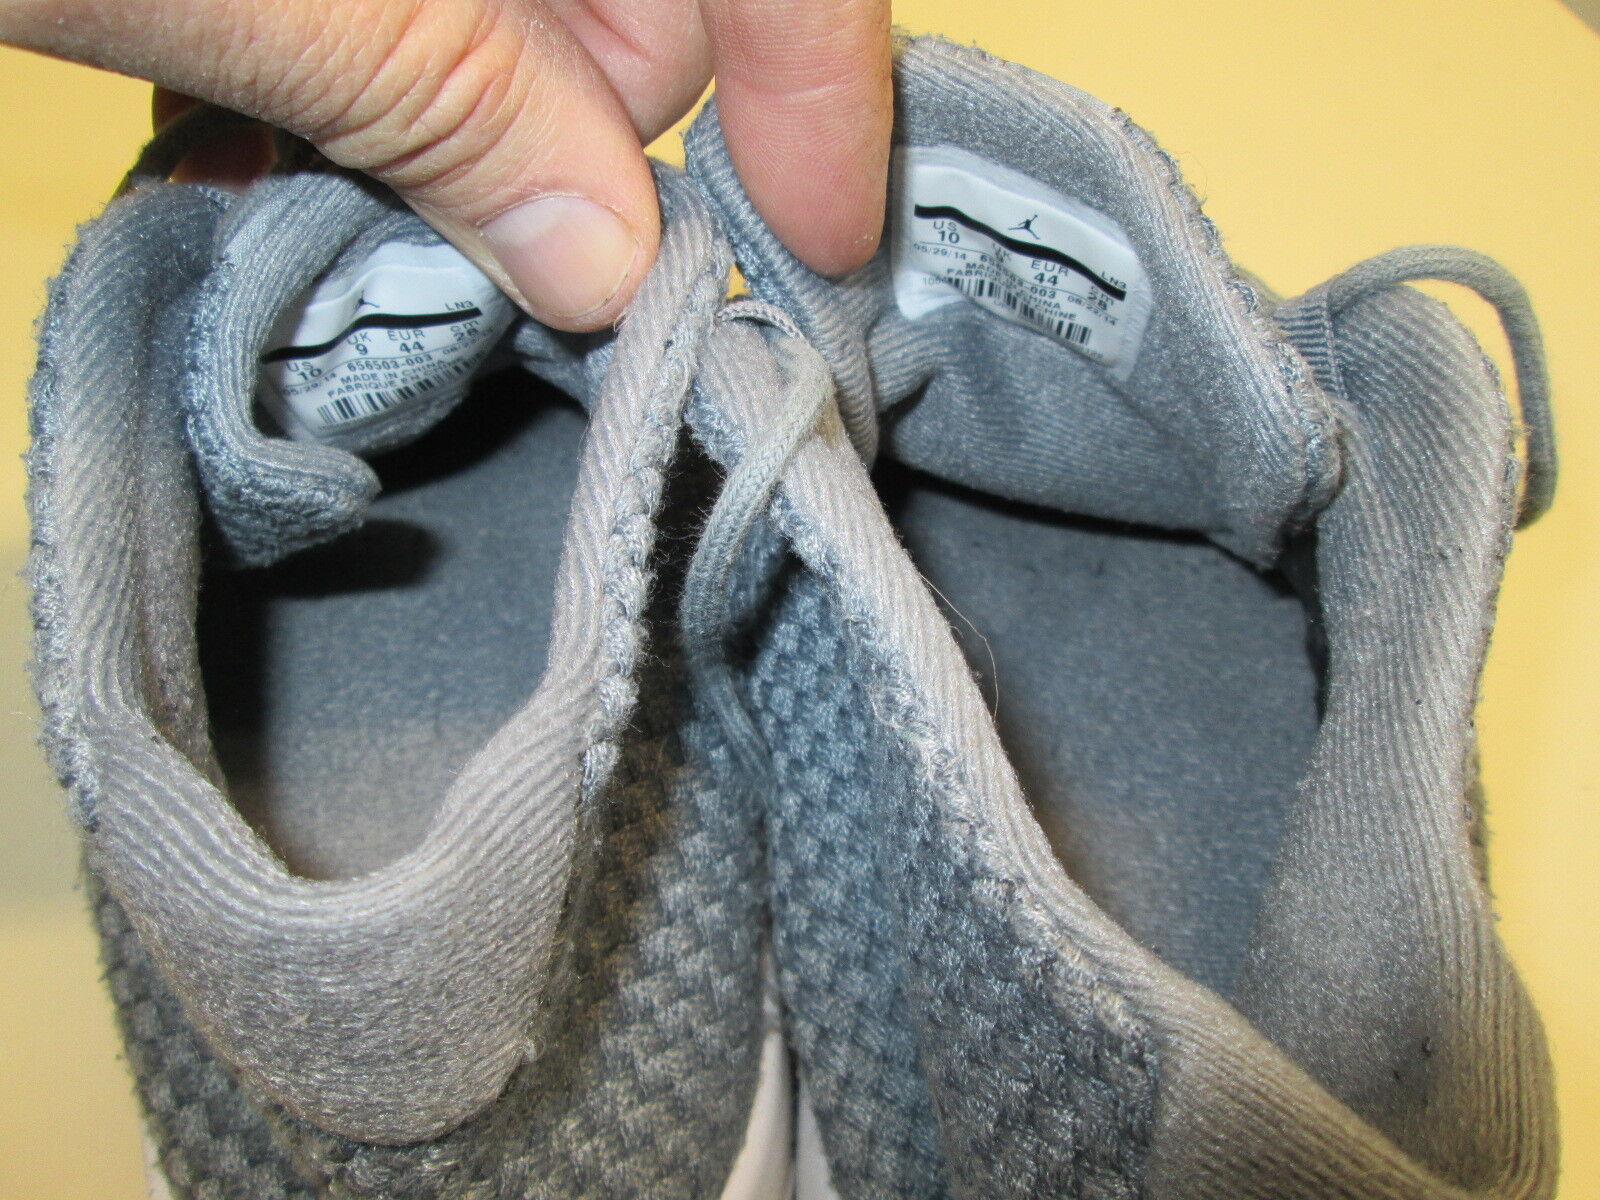 Nike air max 95 soa soa 95 aq5100 dt 300 deion sanders rabbia uomini verdi sz 7,5 13 755b03